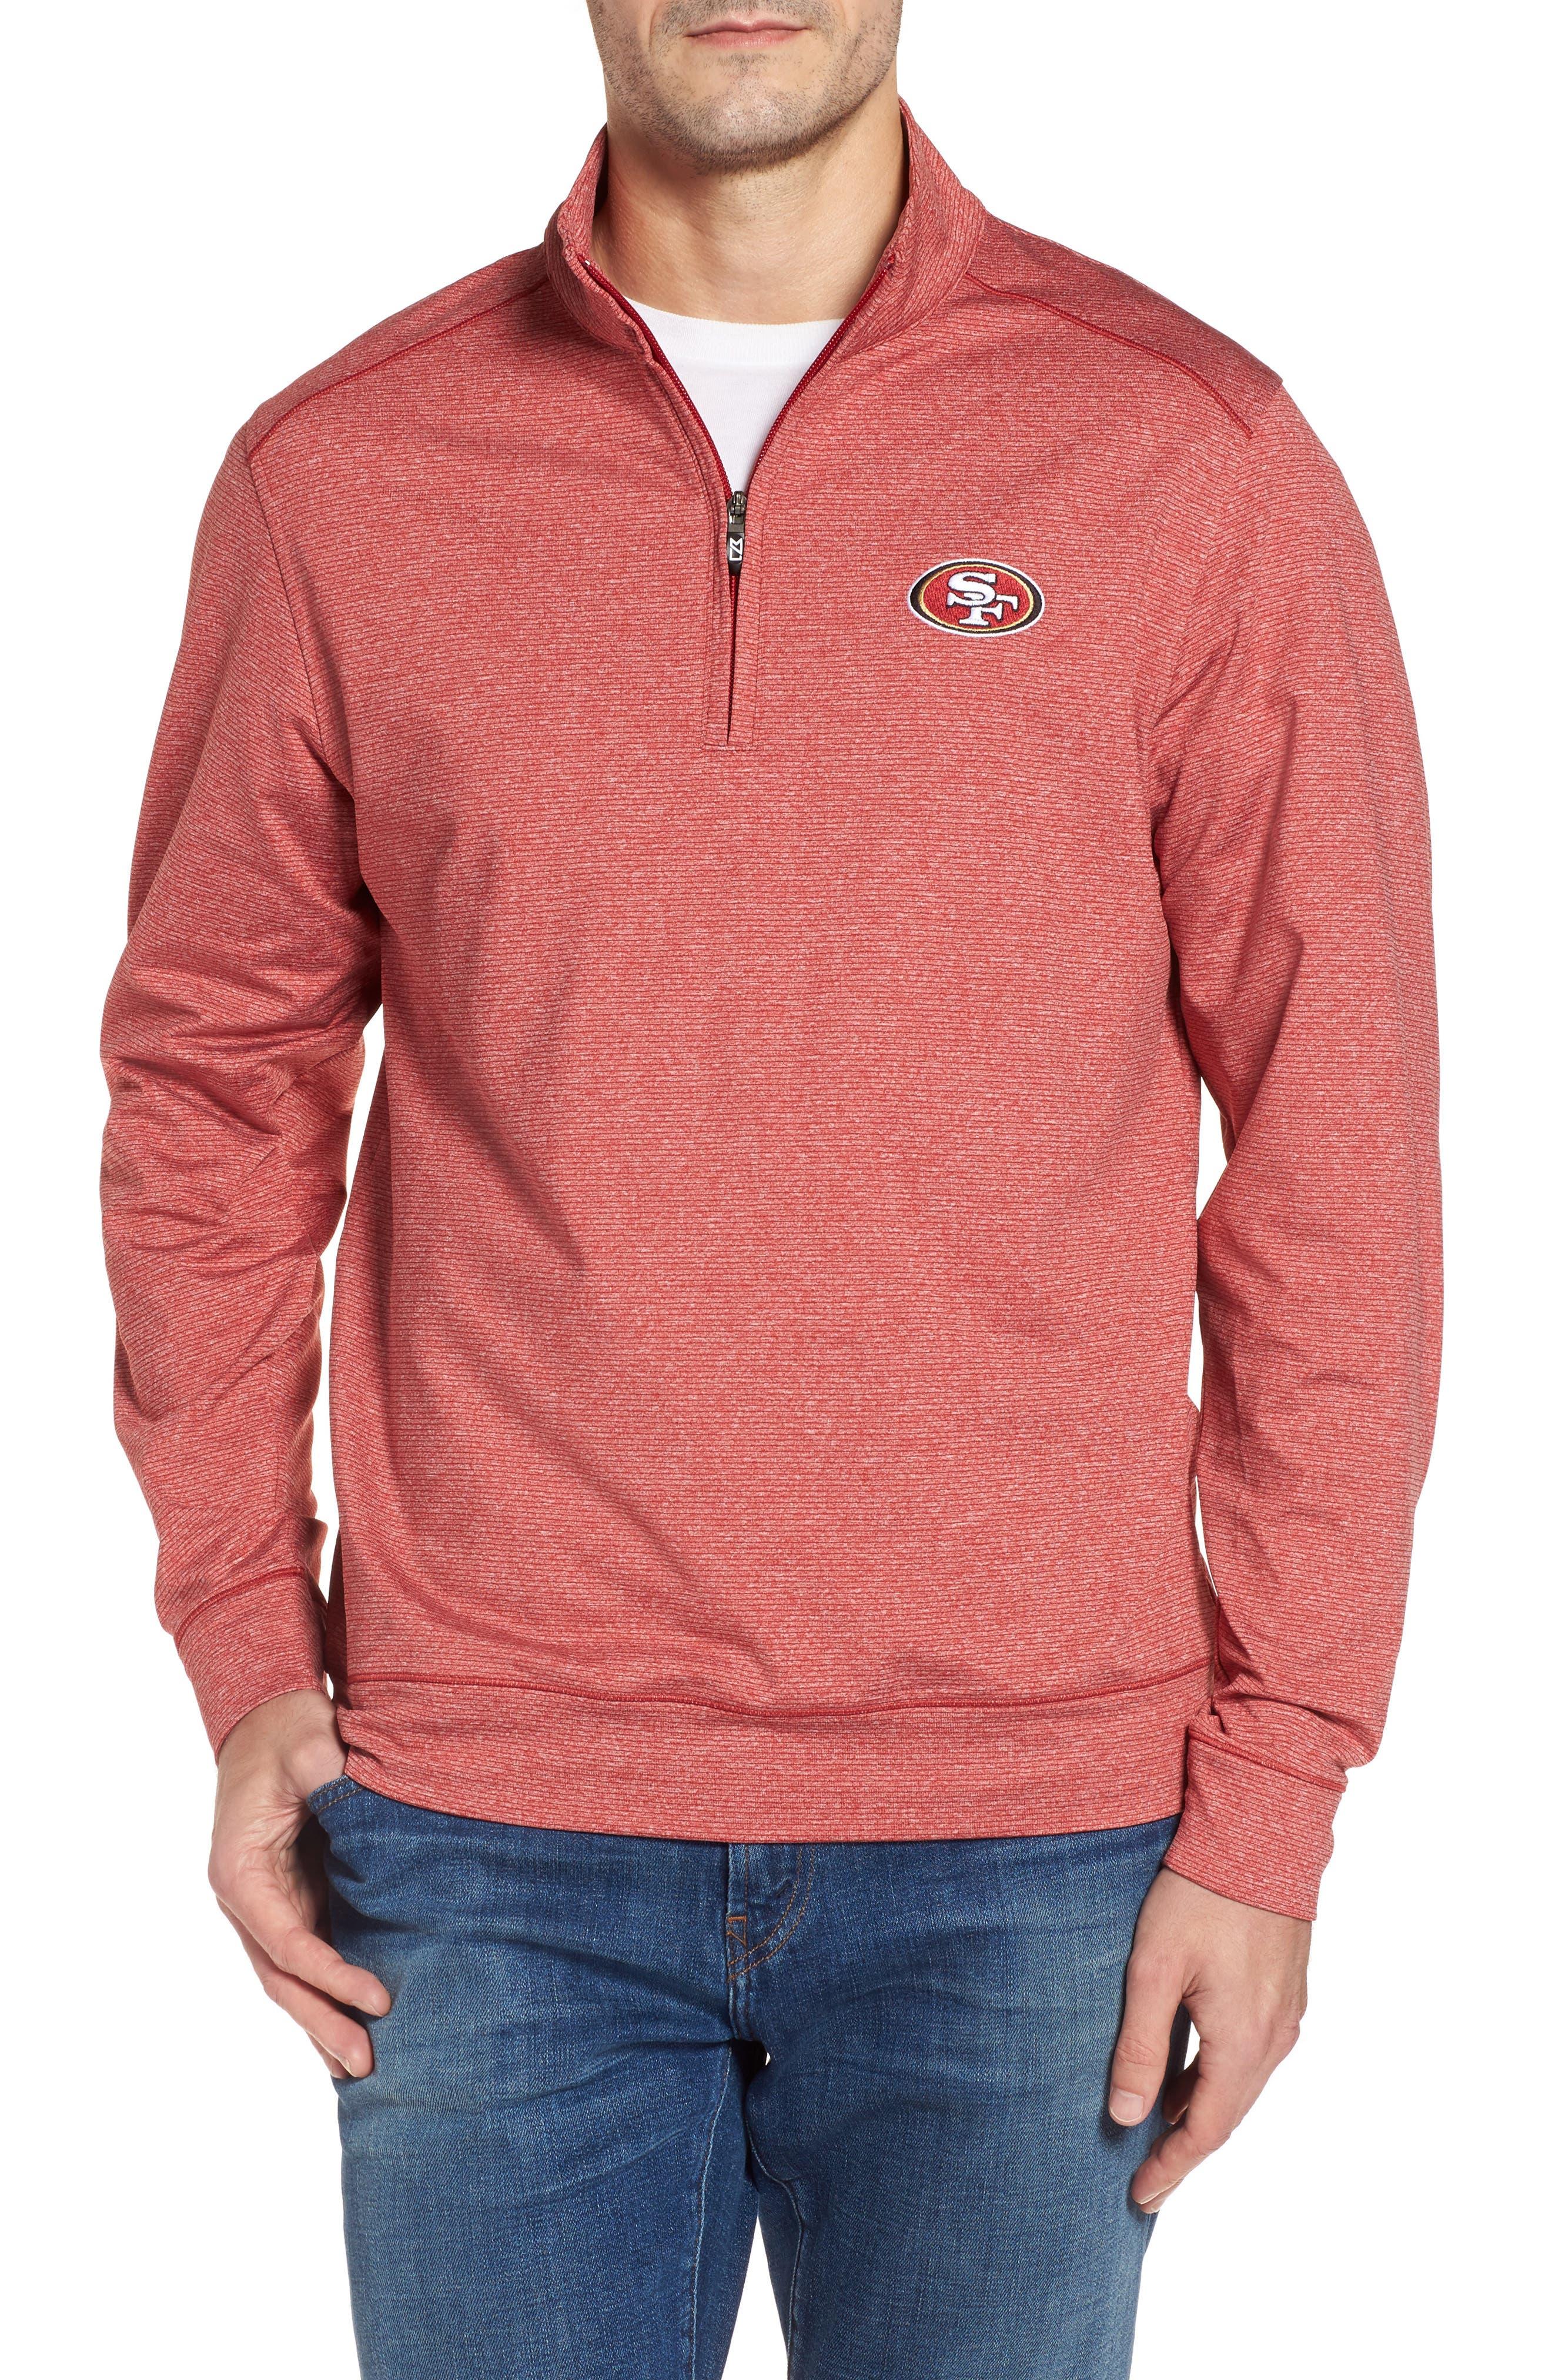 Shoreline - San Francisco 49ers Half Zip Pullover,                             Main thumbnail 1, color,                             615